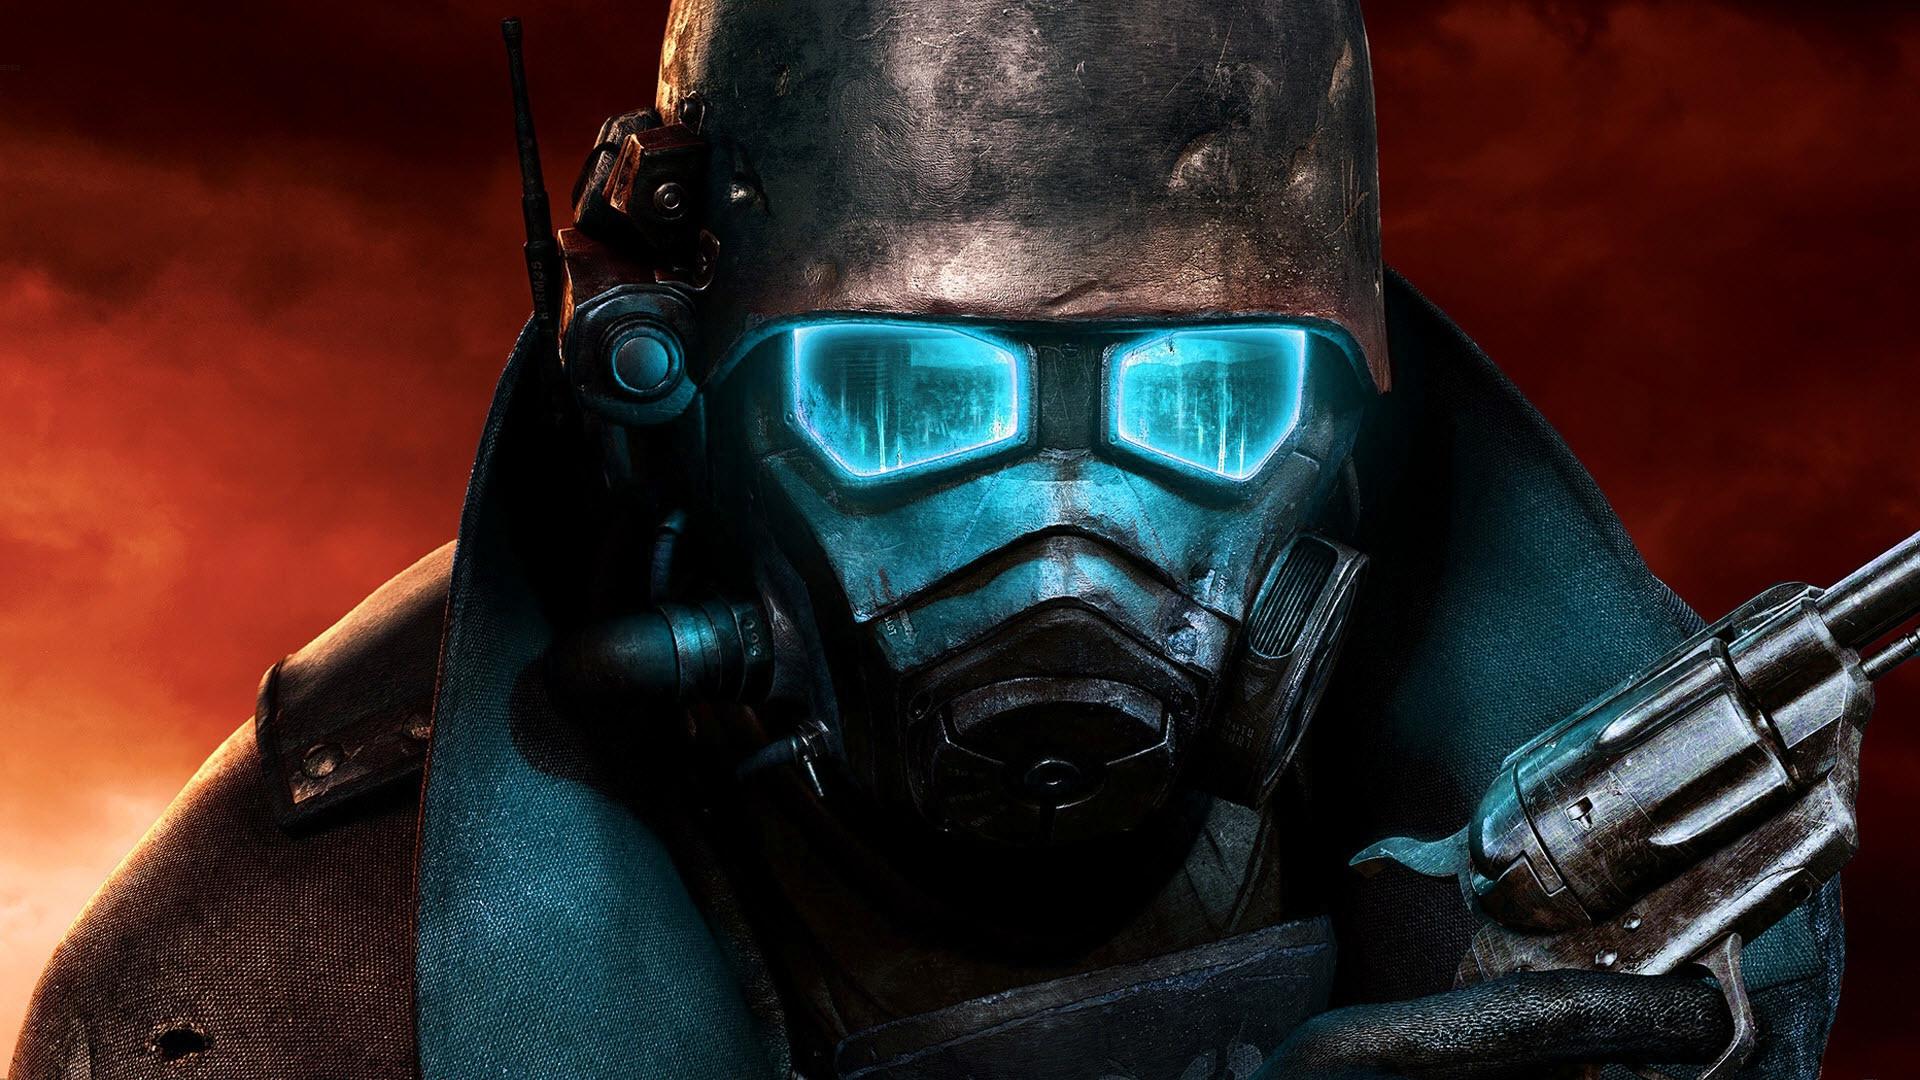 Res: 1920x1080, Fallout New Vegas HD Wallpaper 1080p